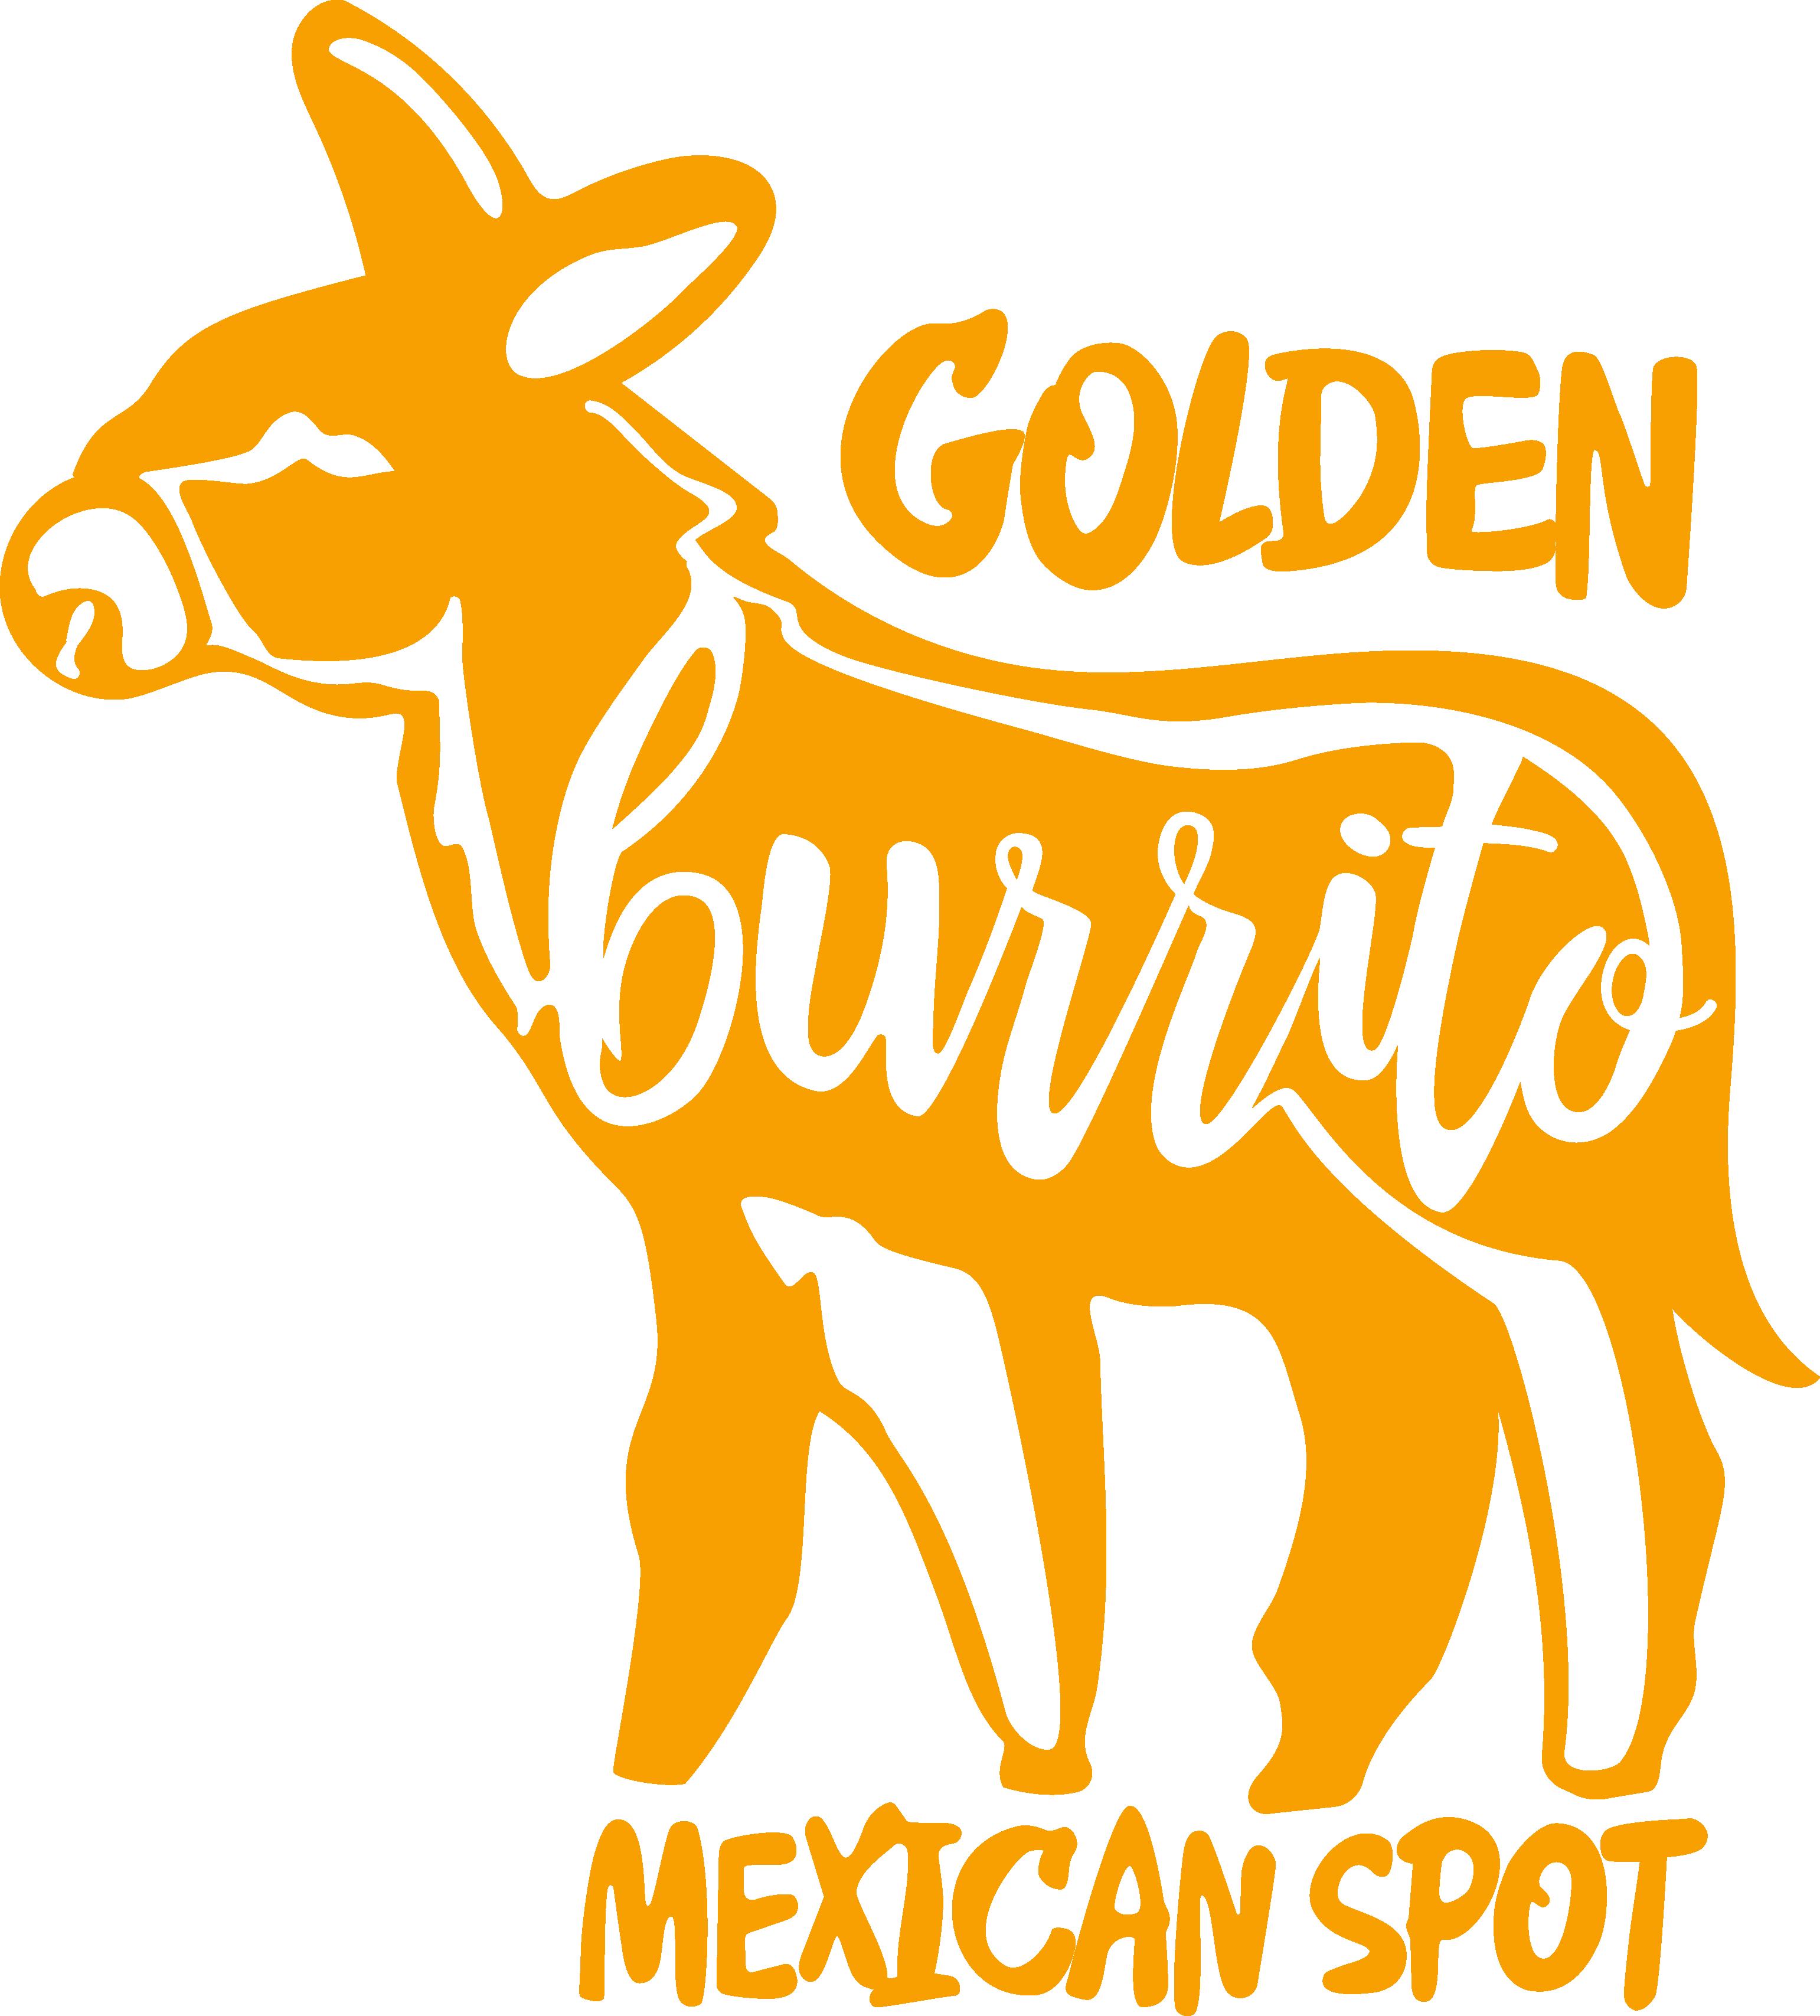 Golden burrito restaurant in. Donkey clipart donkey mexican